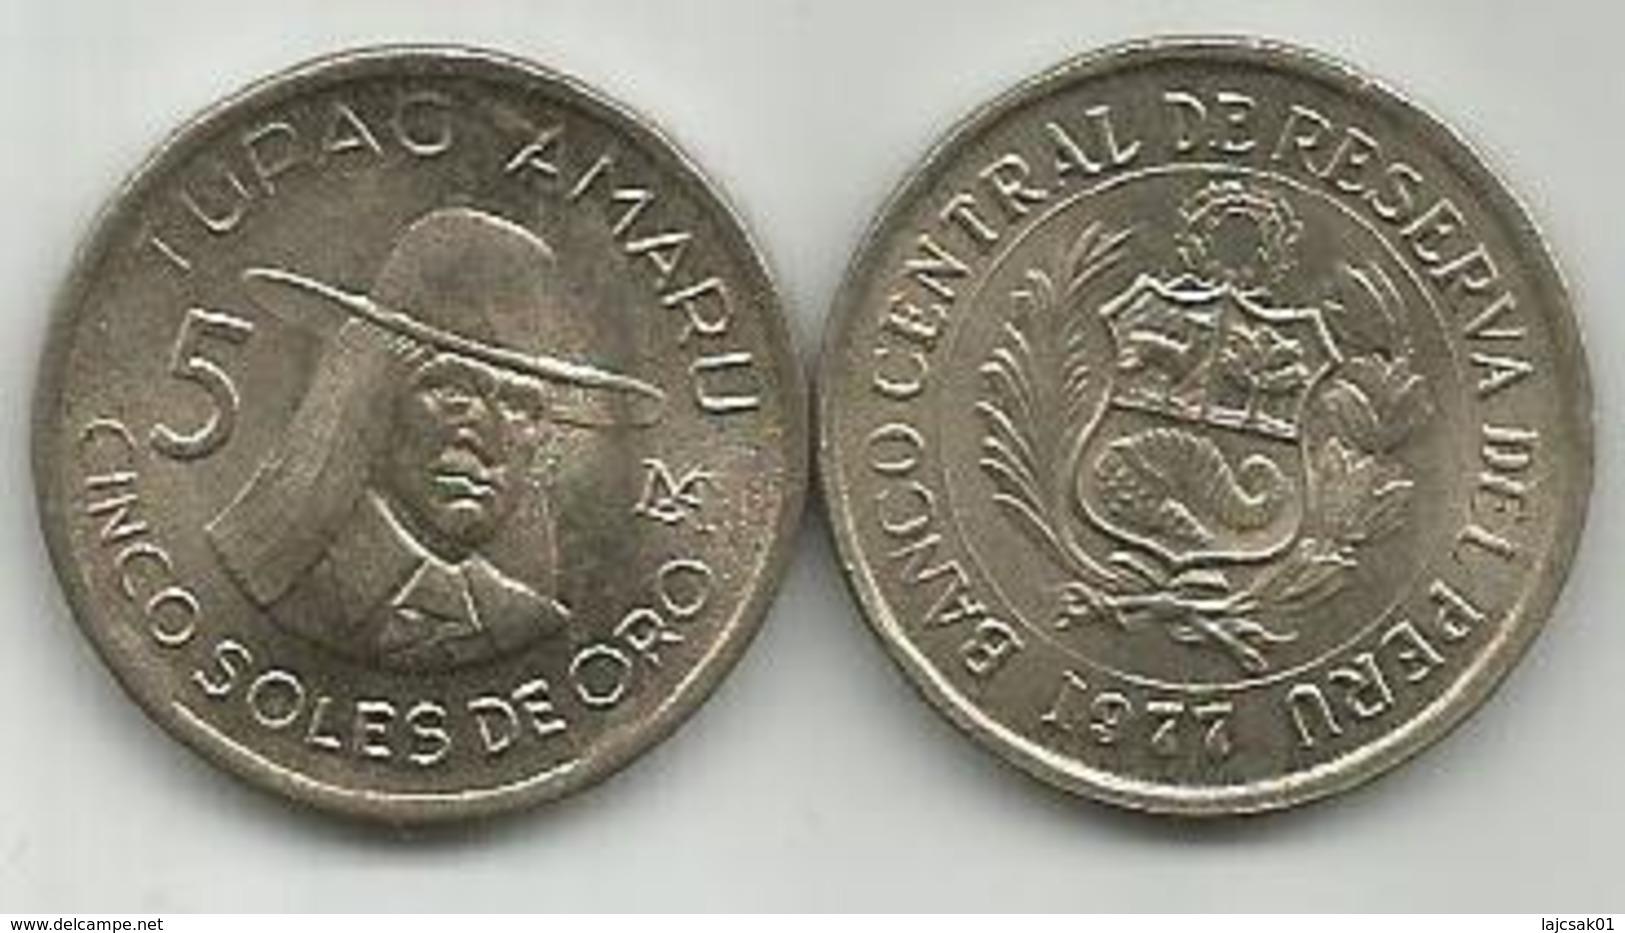 Peru 5 Soles De Oro 1977. High Grade - Pérou